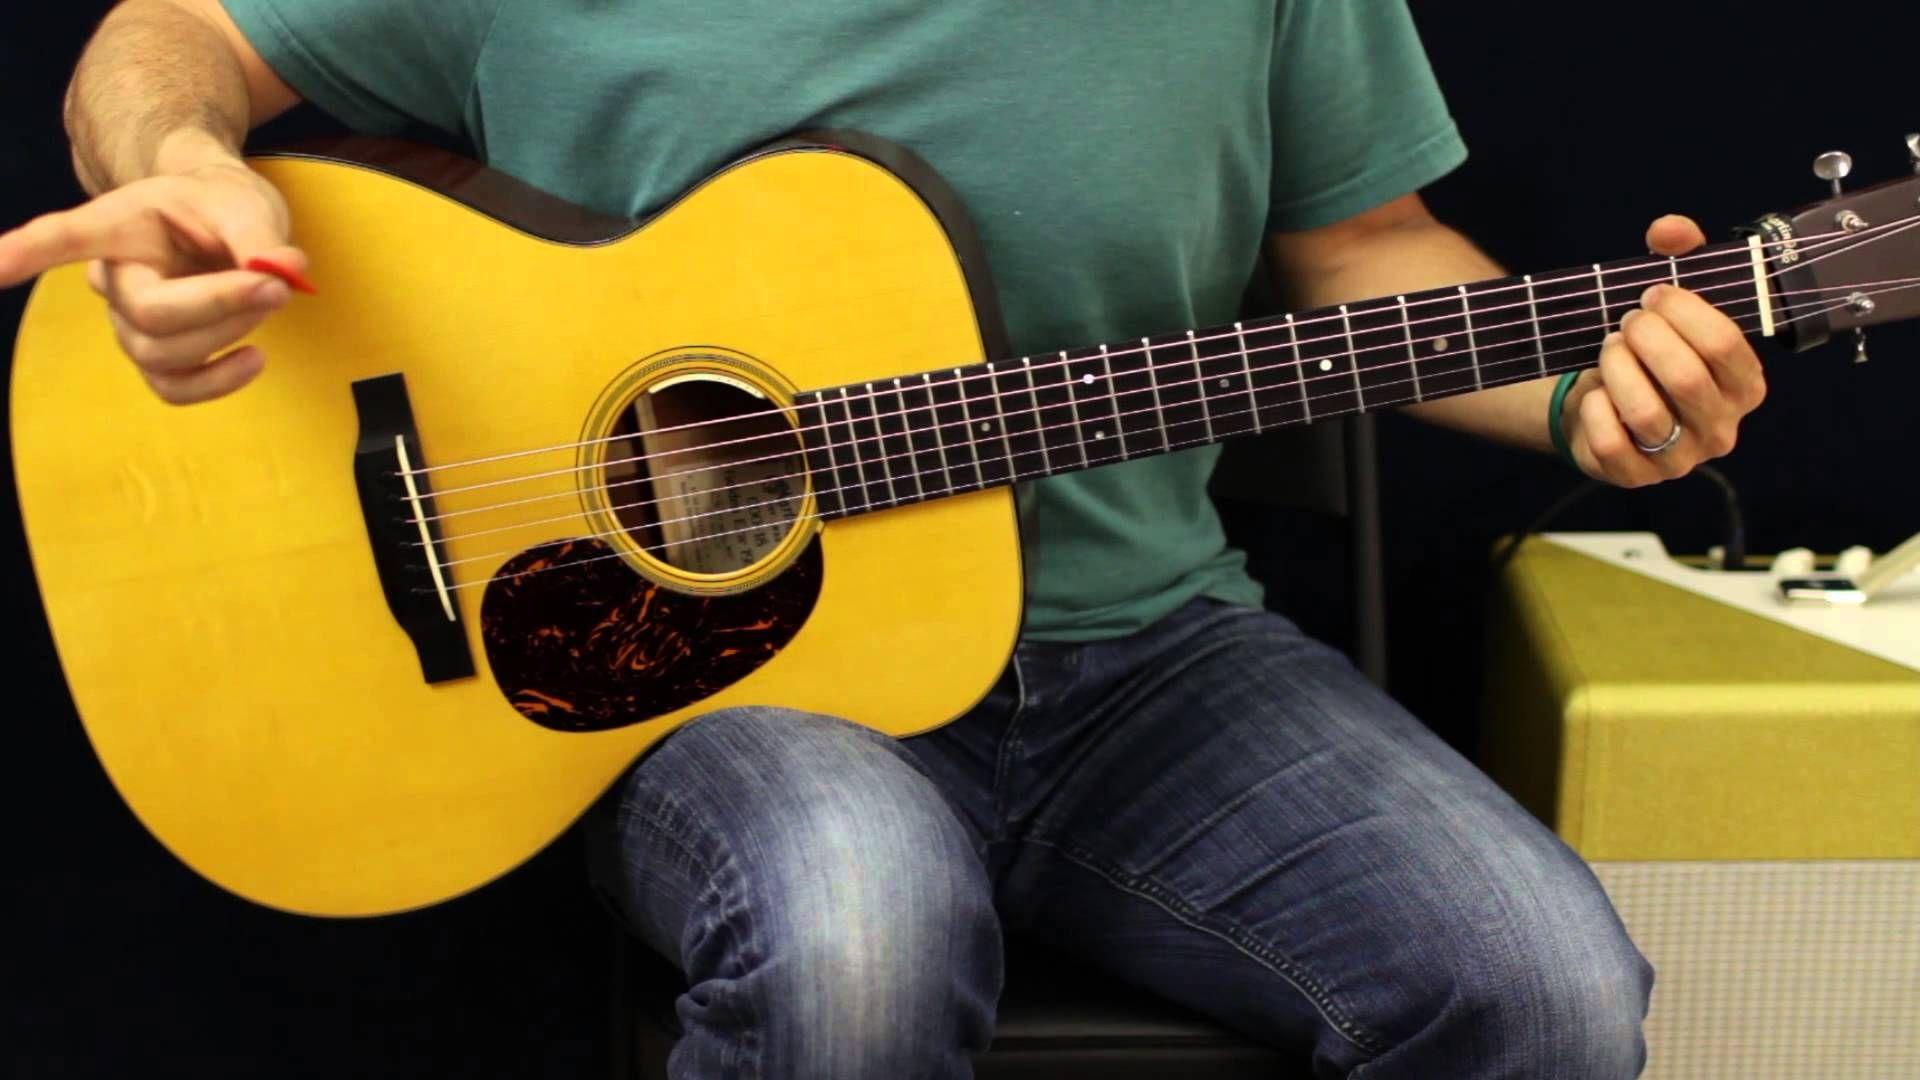 How To Play Darius Rucker Wagon Wheel Acoustic Guitar Lesson